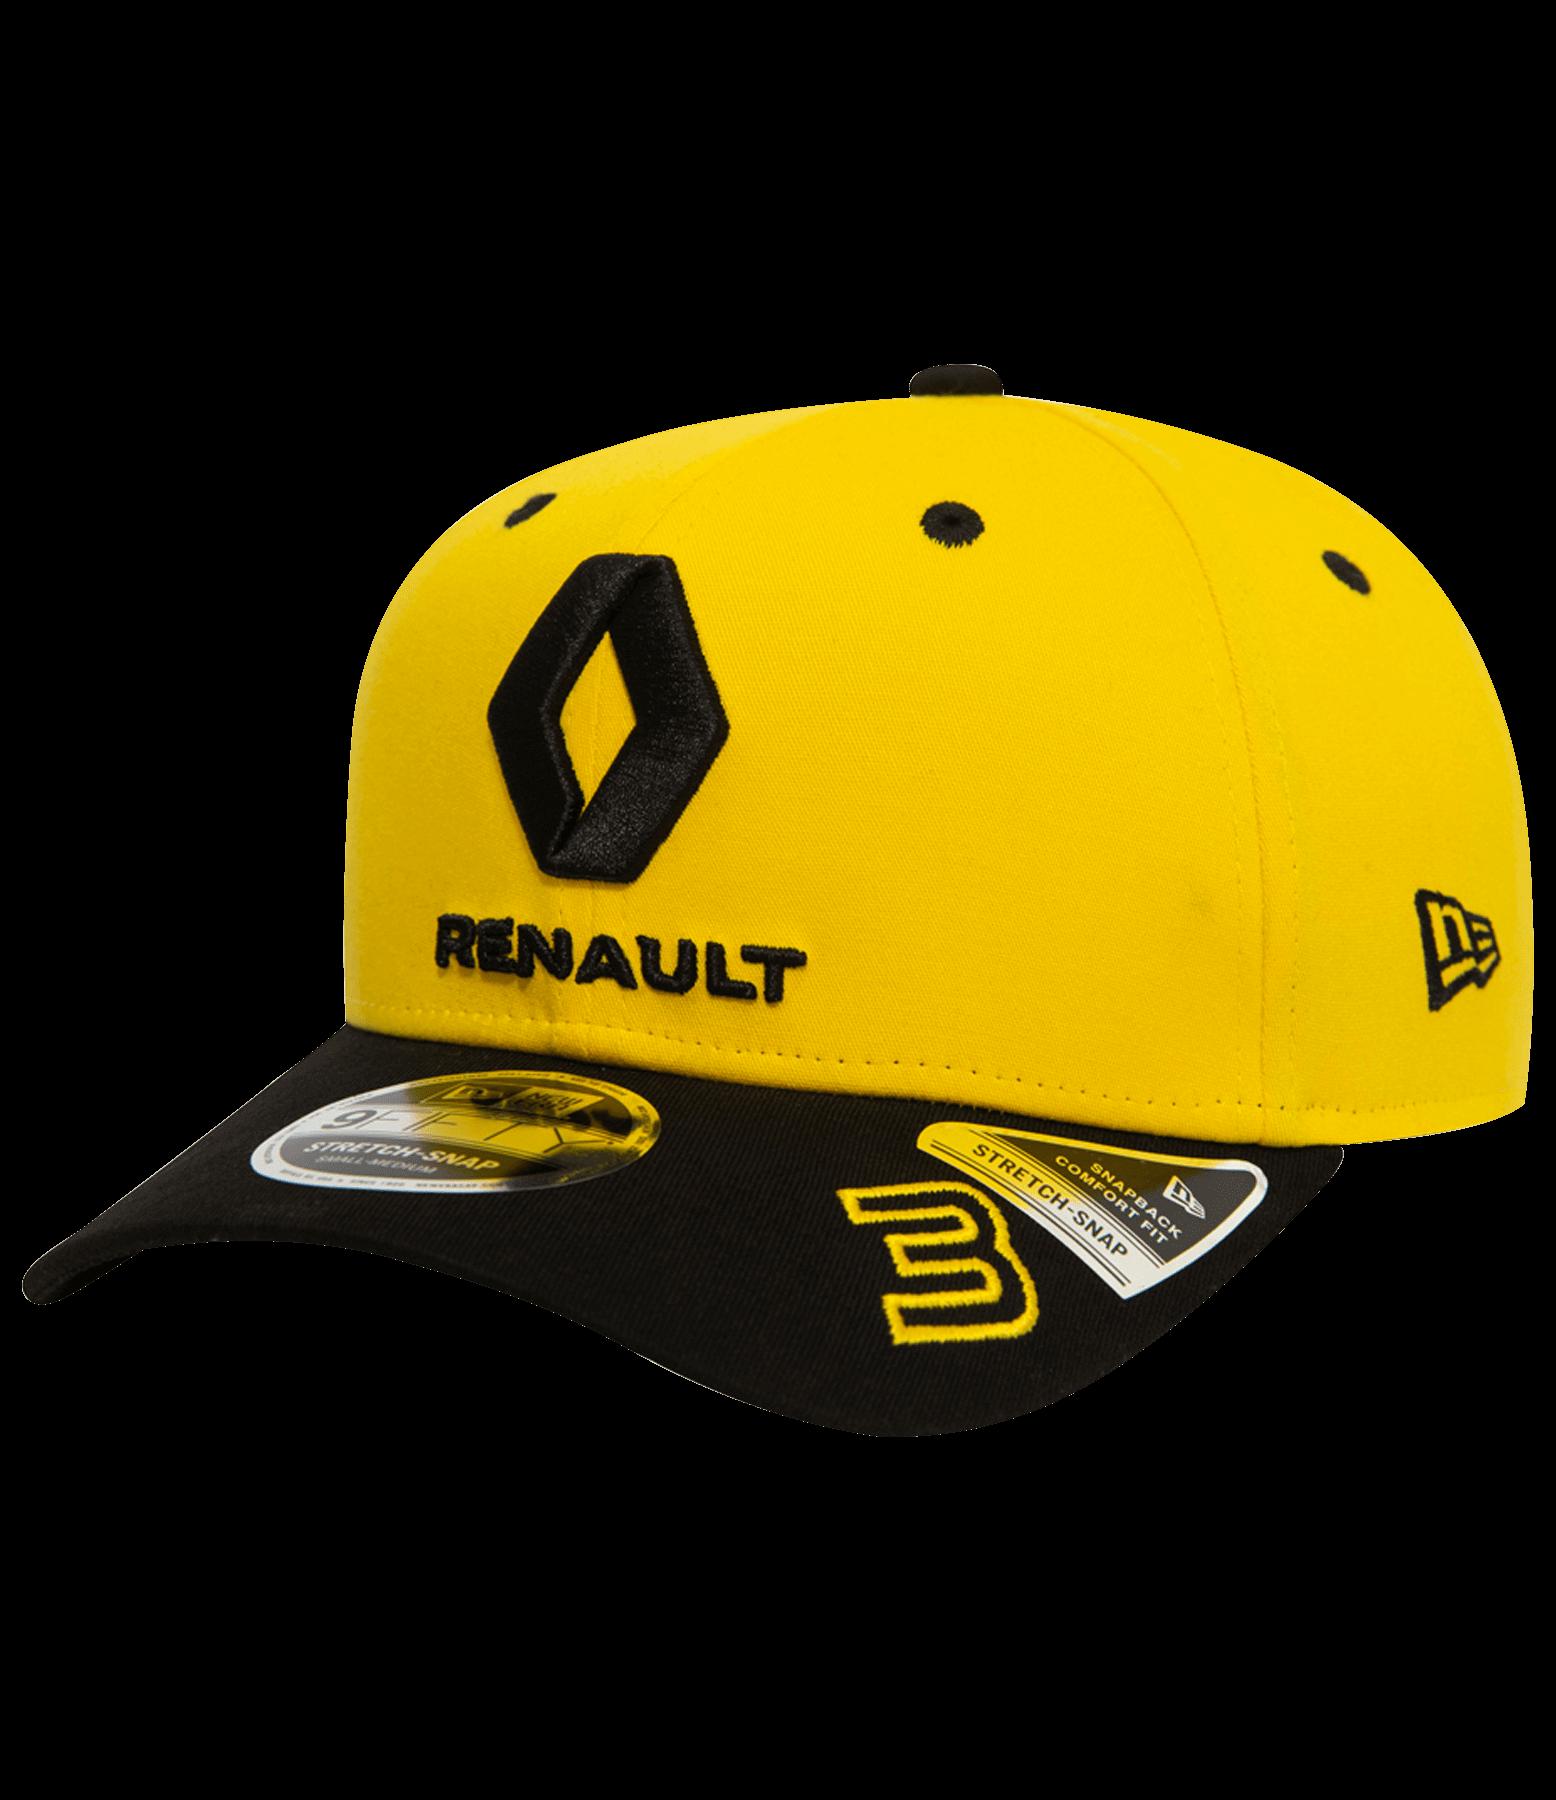 Daniel Ricciardo 2019 official cap - yellow